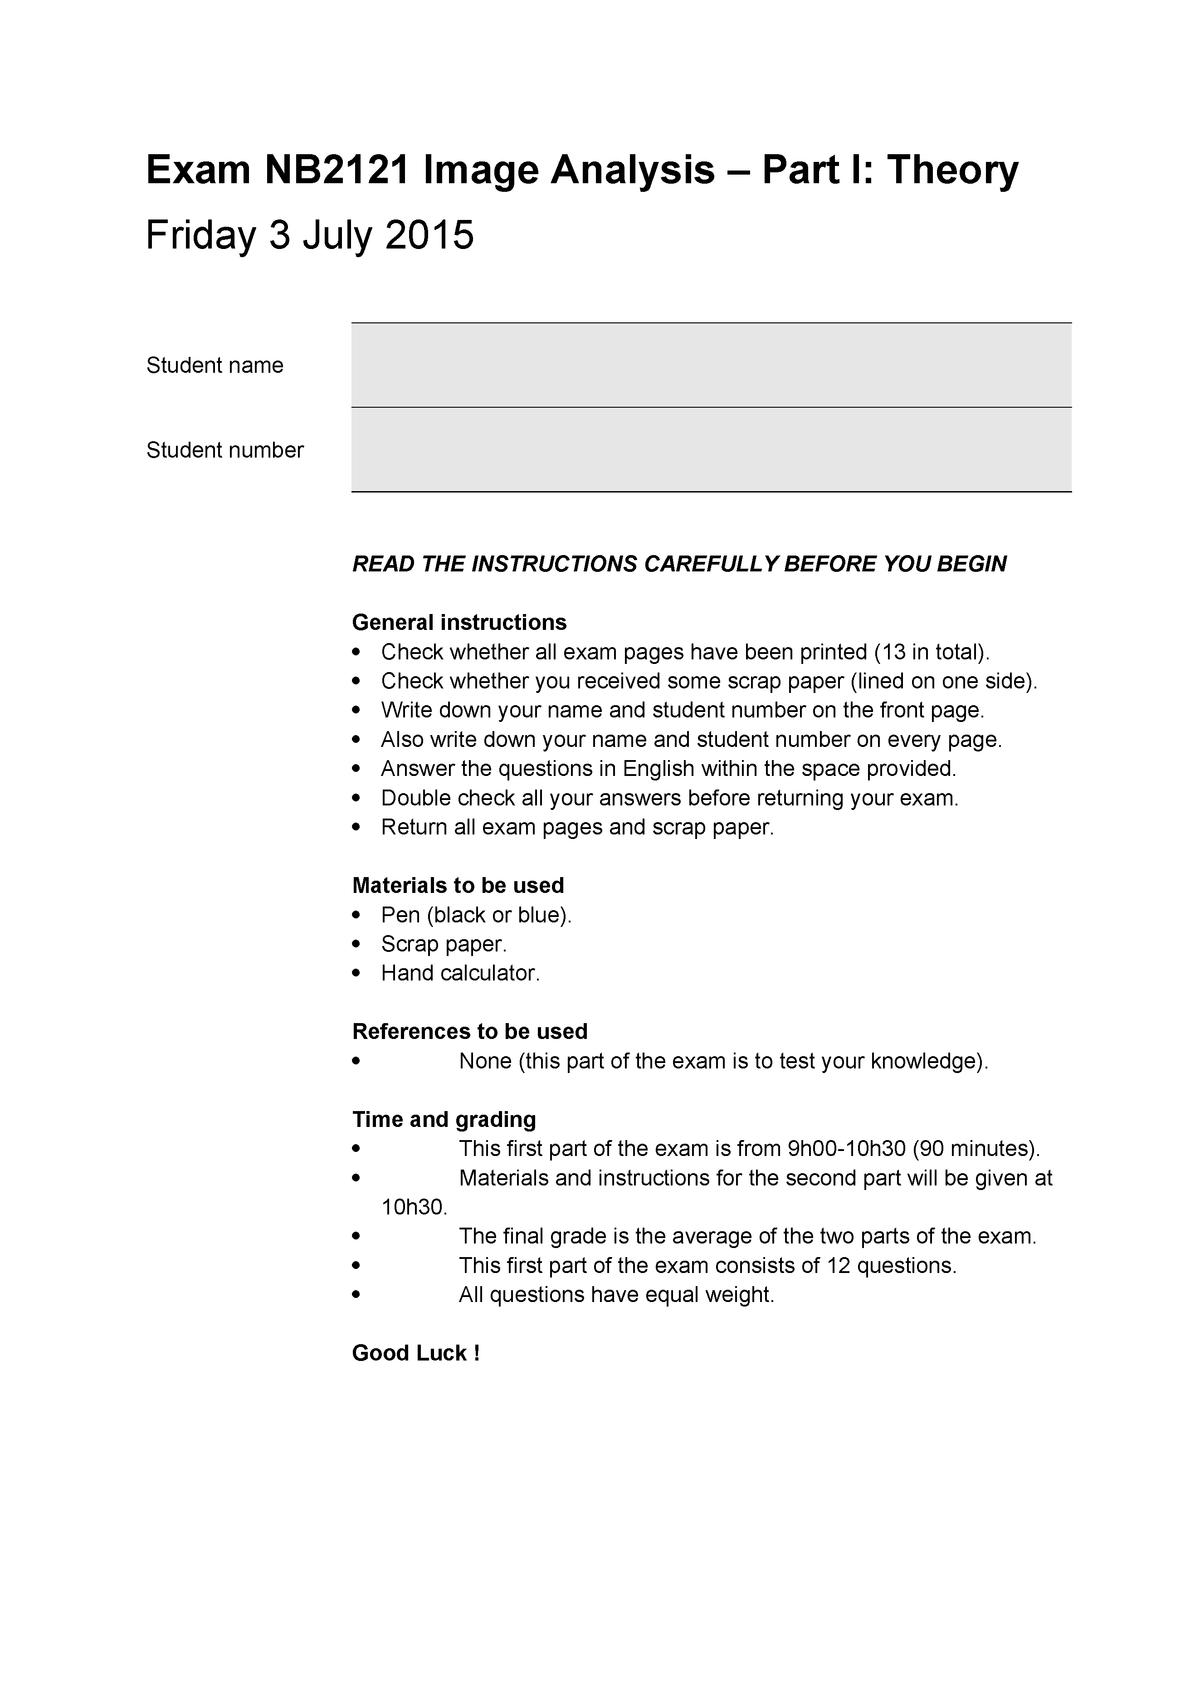 Proeftentamen 24 juni 2016, vragen - Image Analysis NB2121